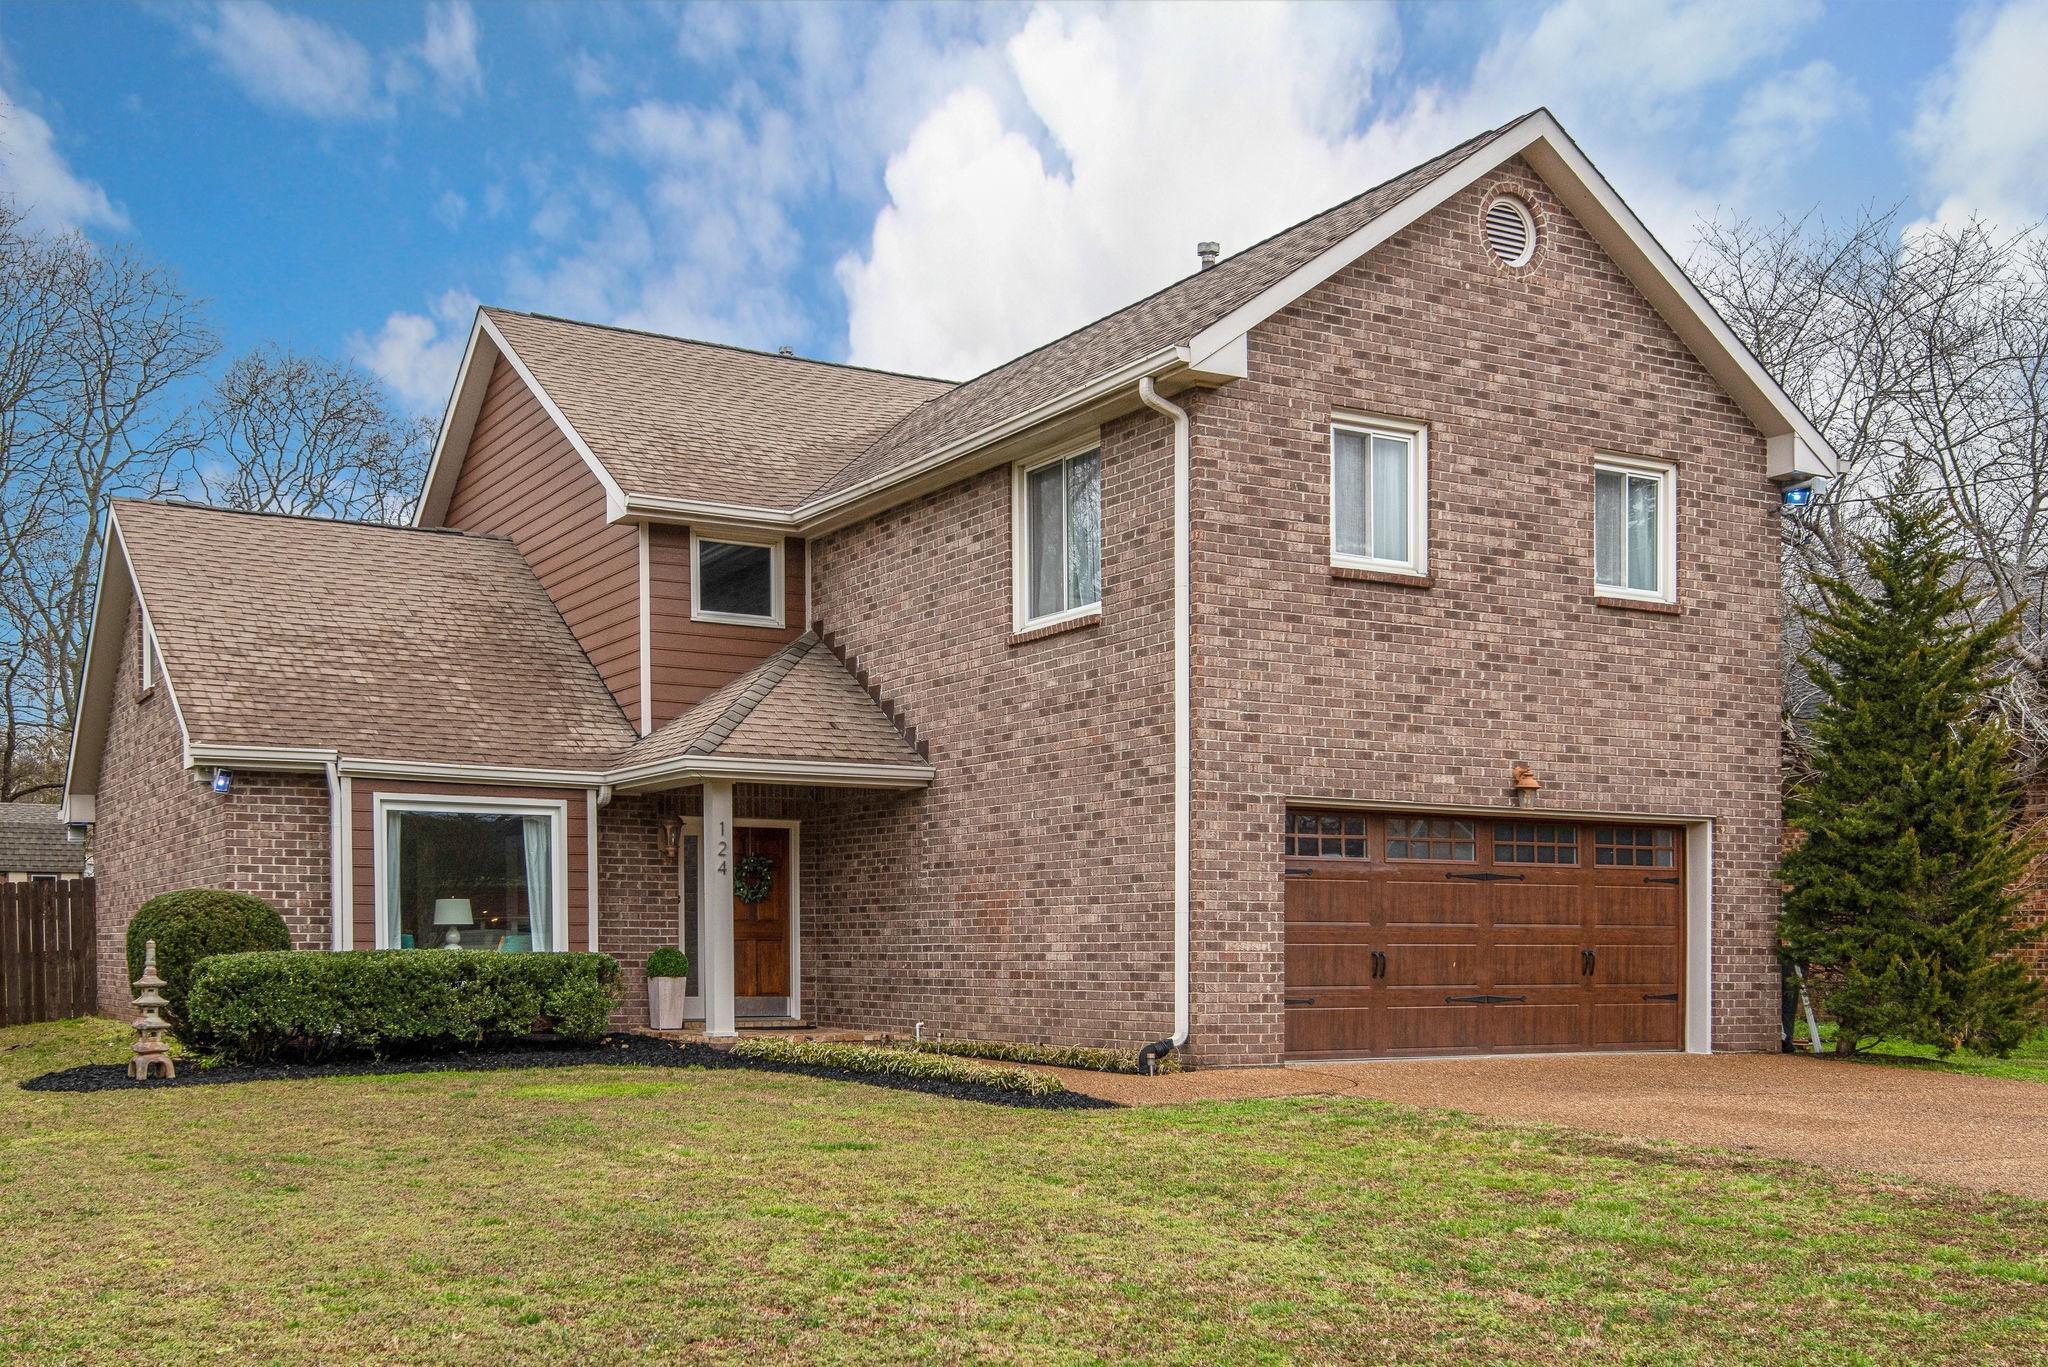 124 Lucinda Ct, Franklin, TN 37064 - Franklin, TN real estate listing